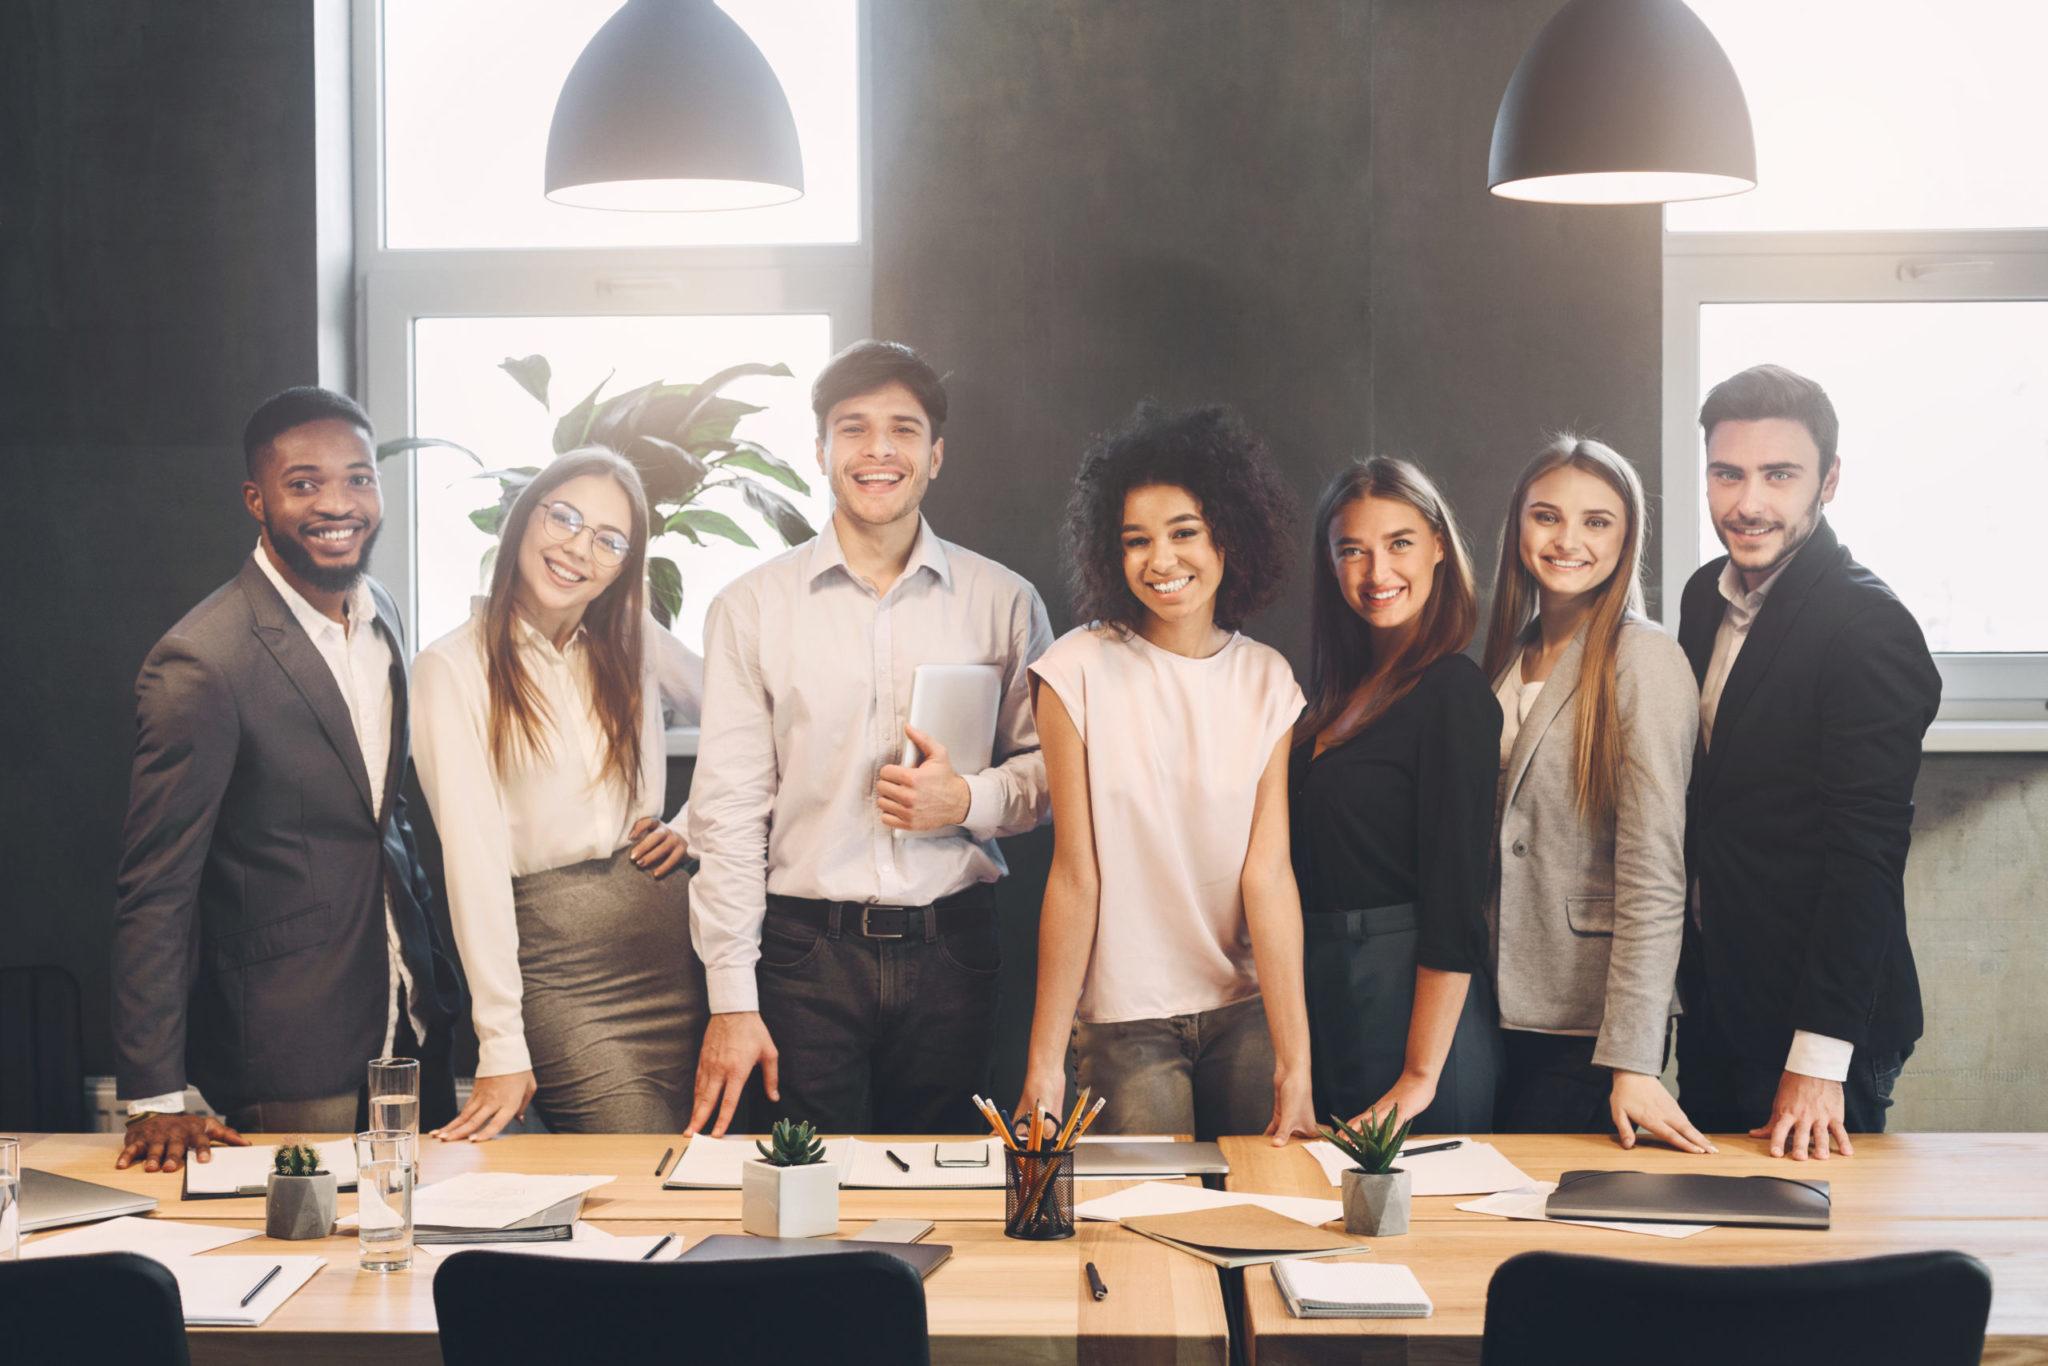 Smiling confident entrepreneurs